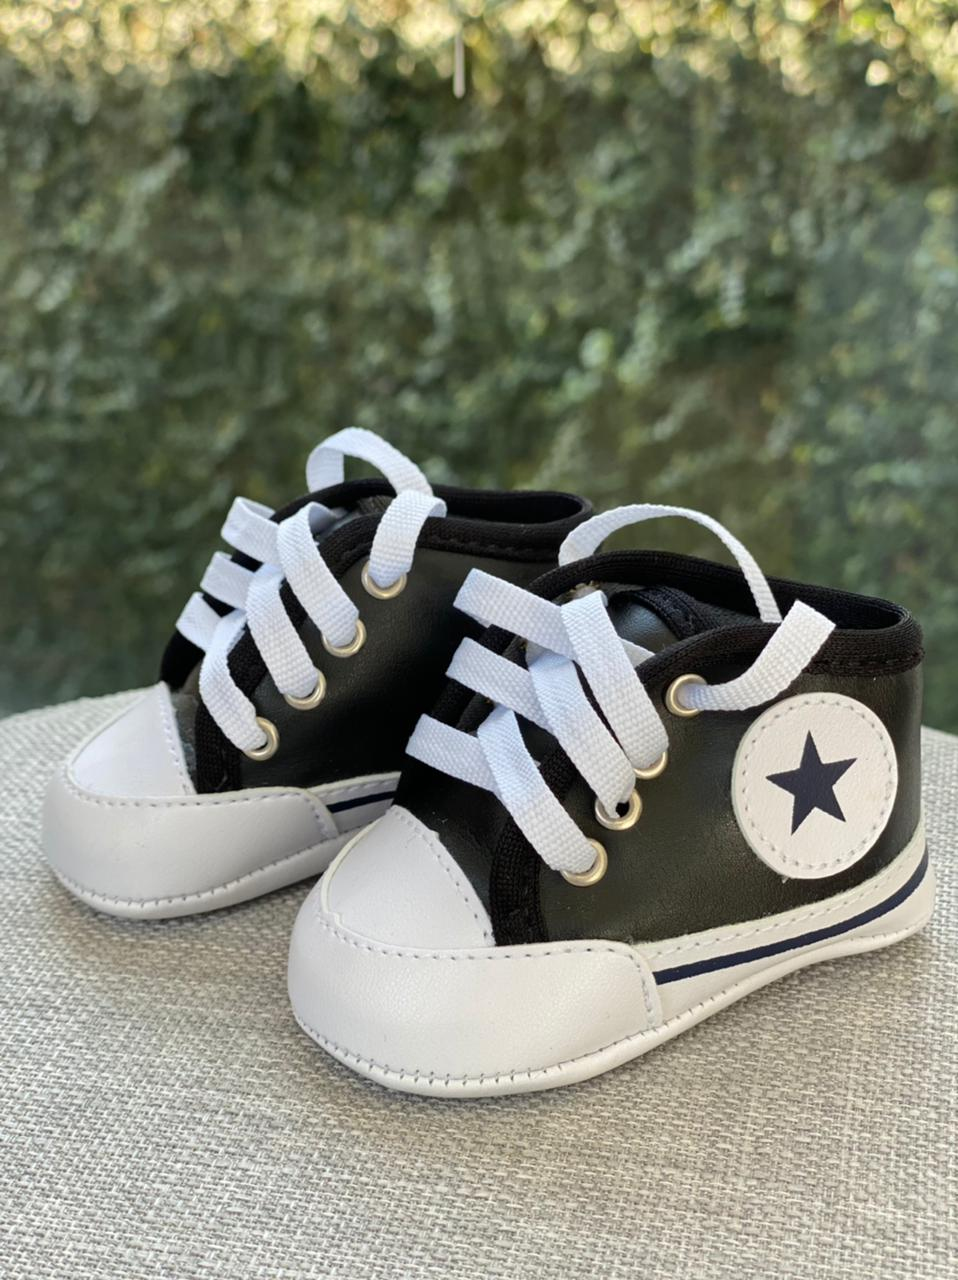 Tennis All Star - Preto